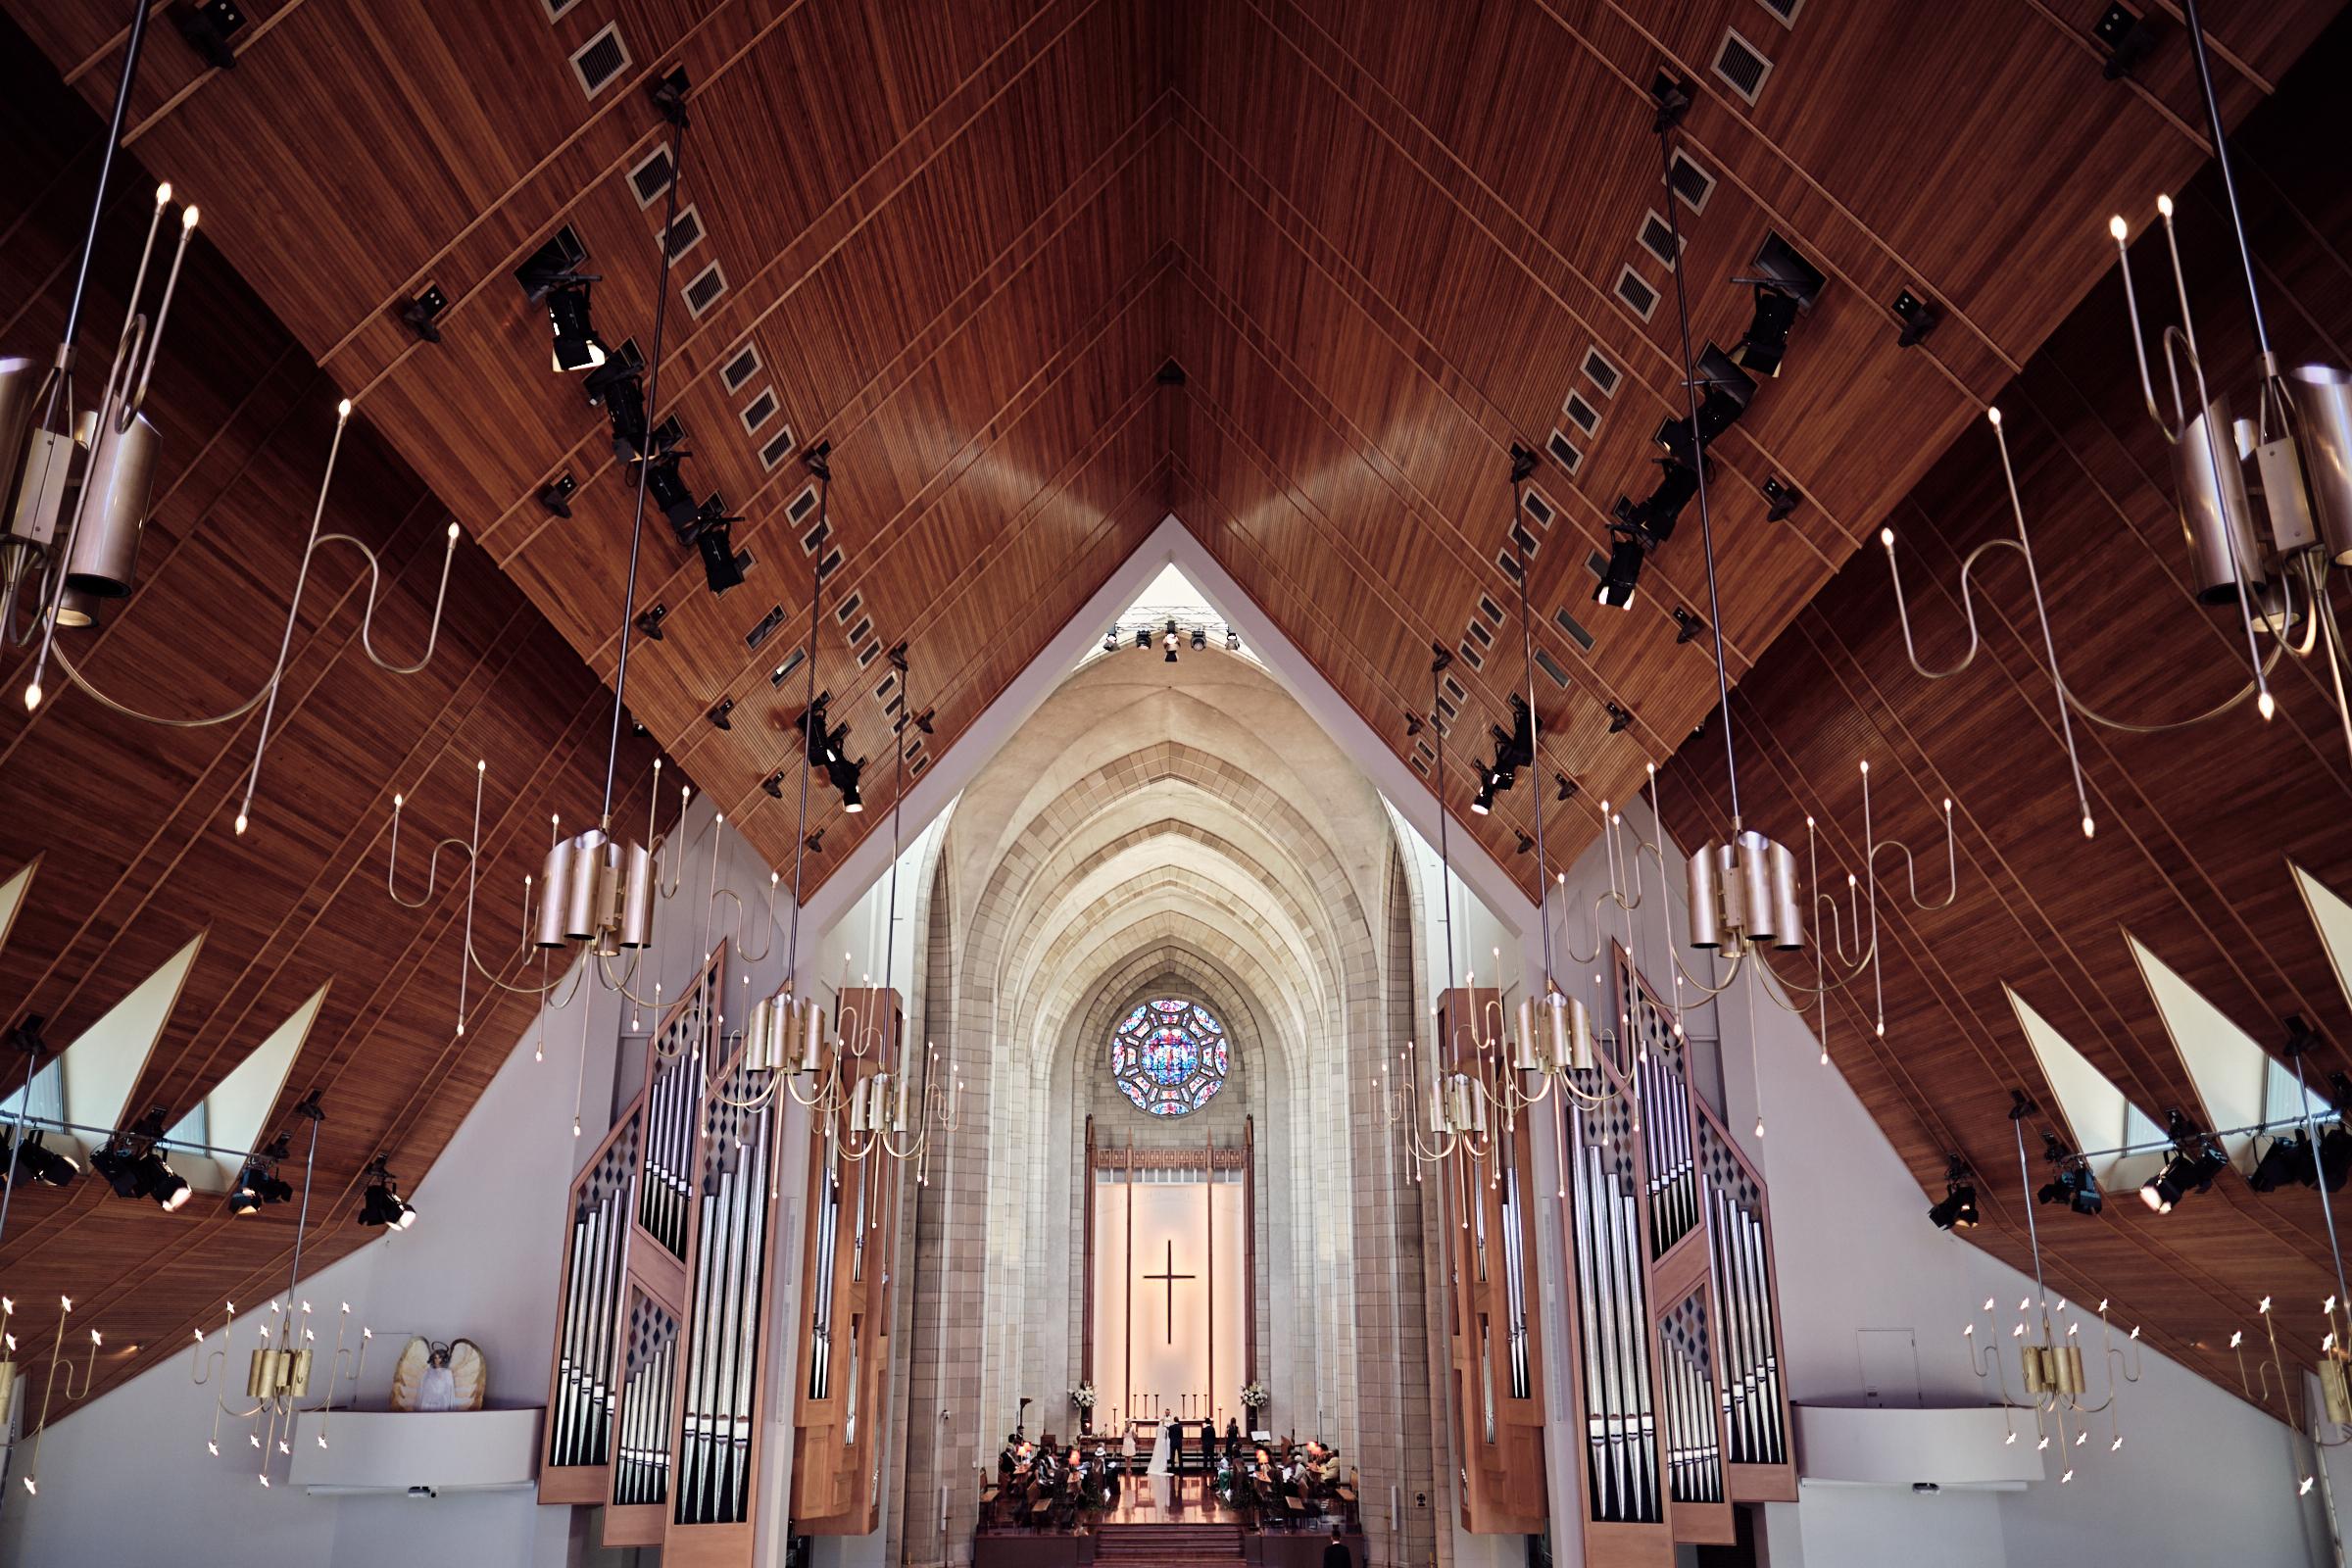 Amazing church